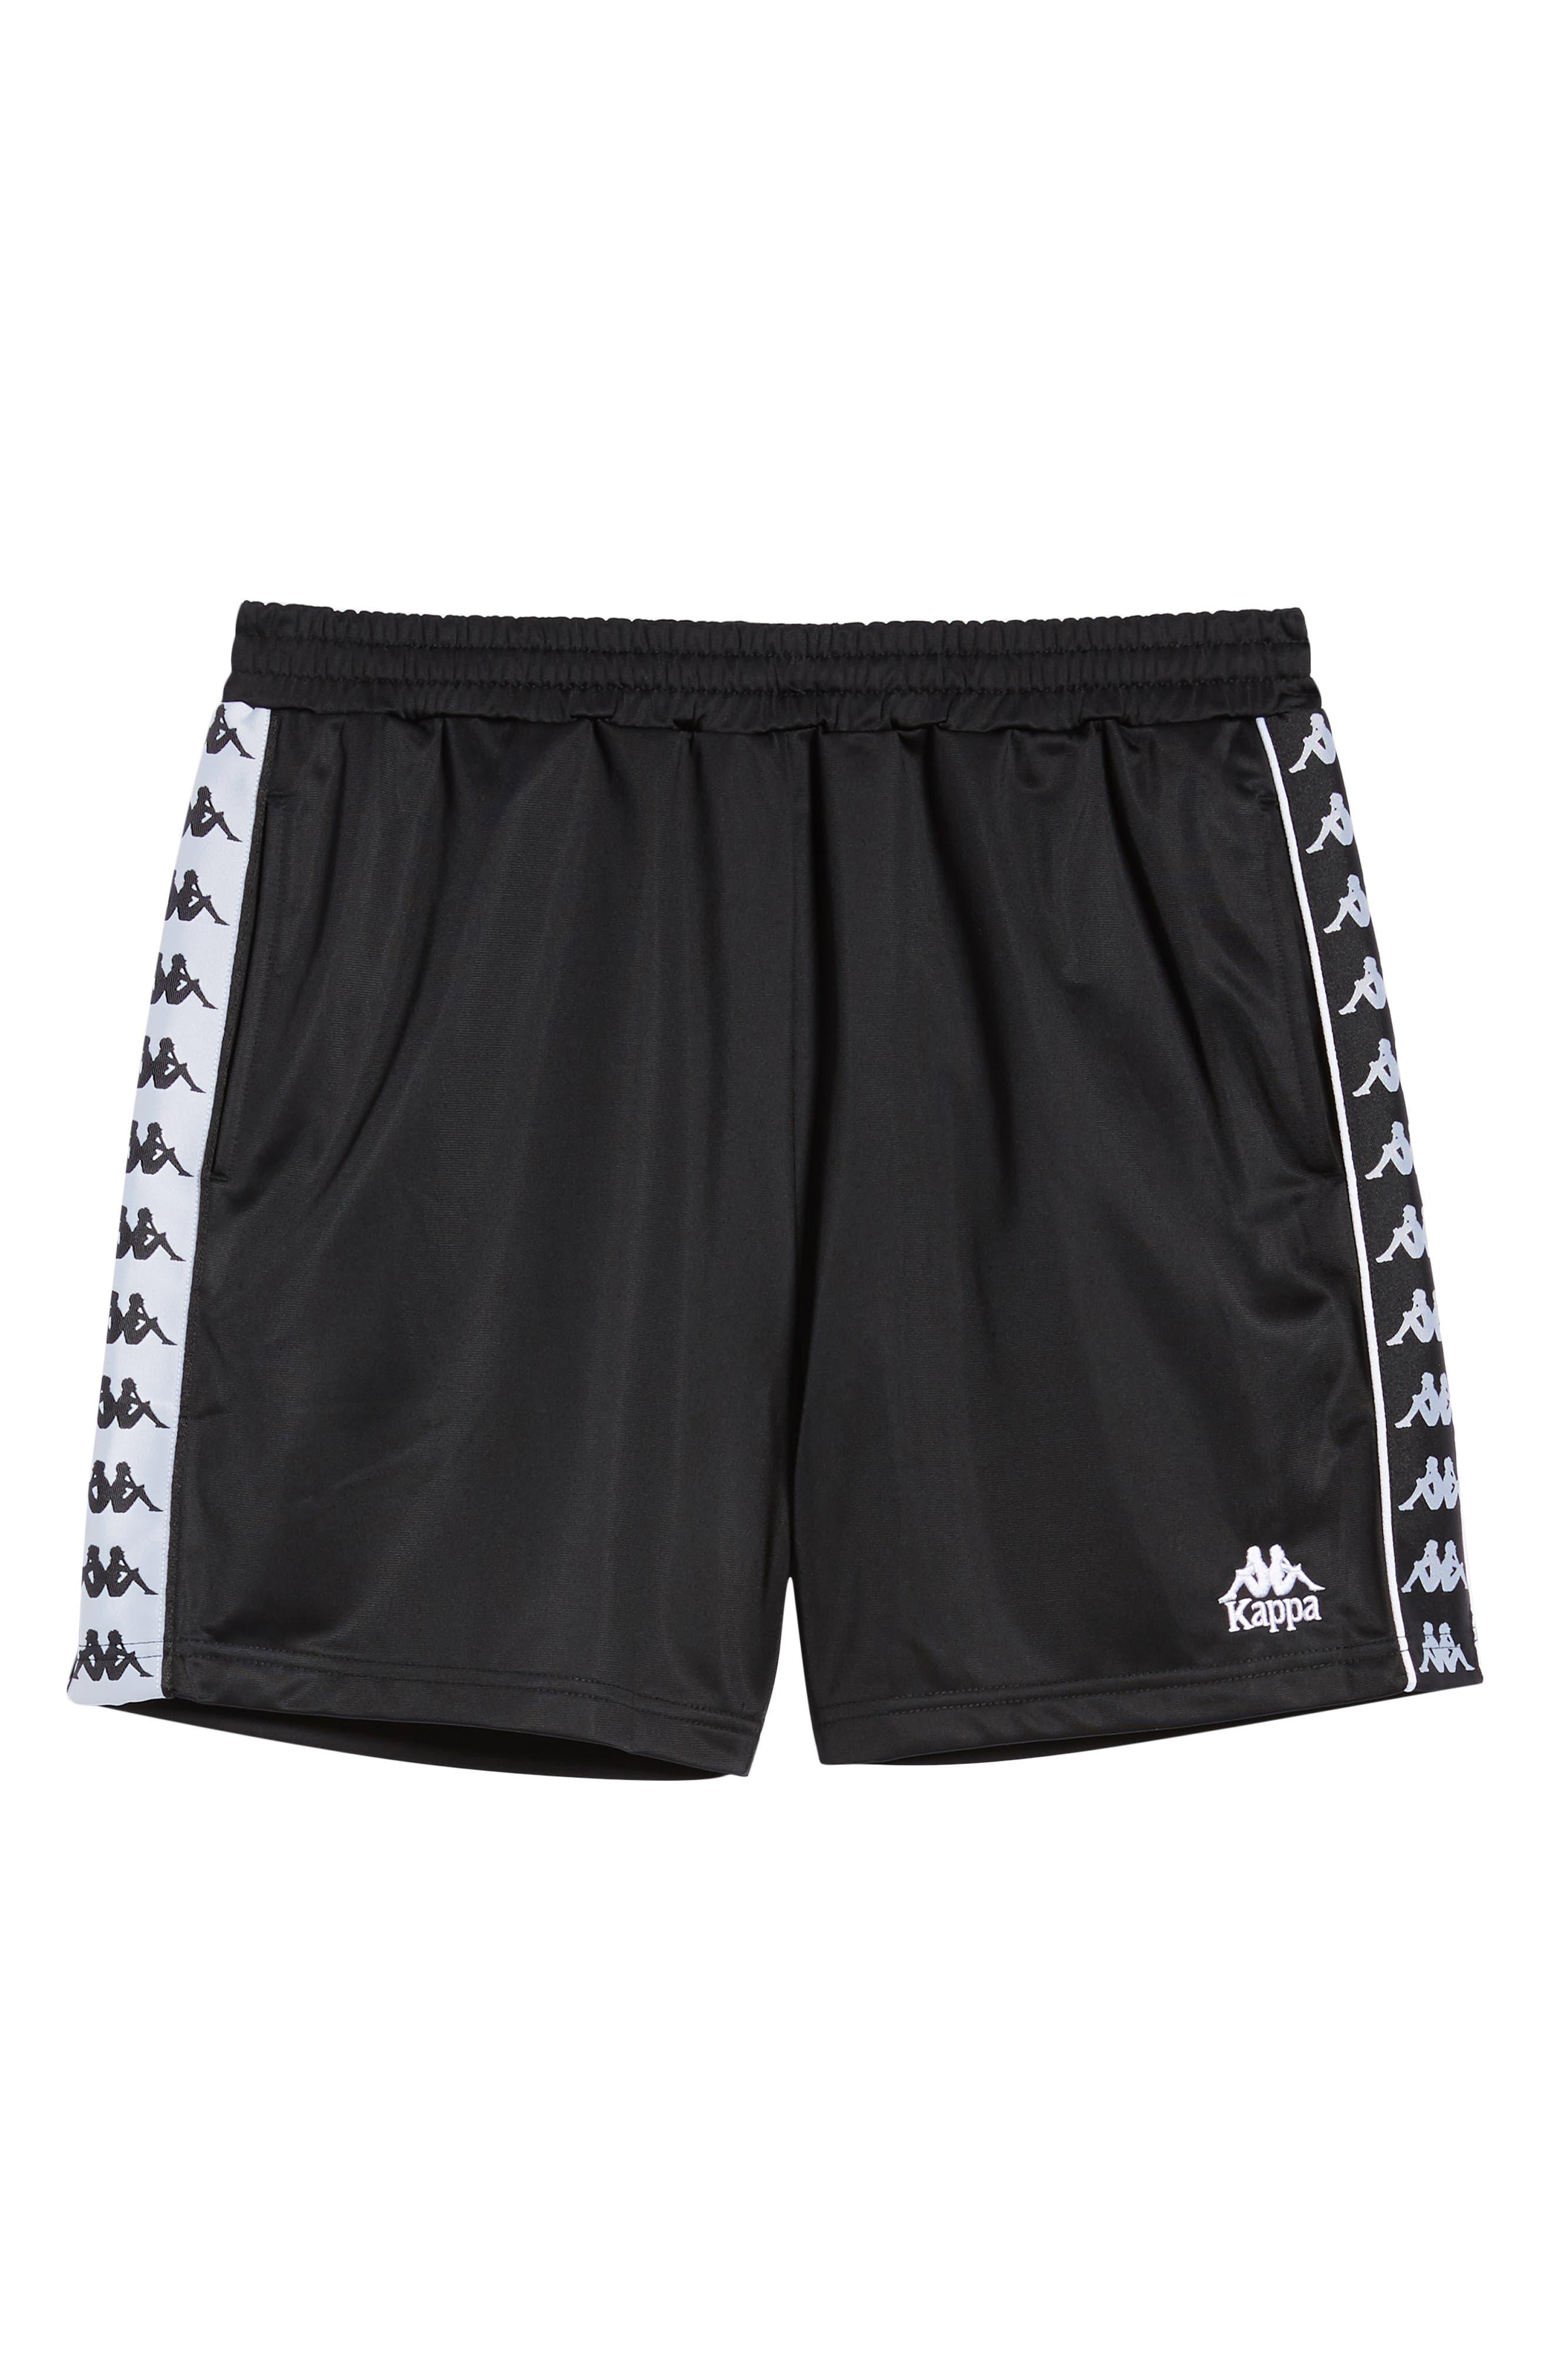 KAPPA, 222 Banda Cole Athletic Shorts, Alternate thumbnail 7, color, BLACK/ WHITE